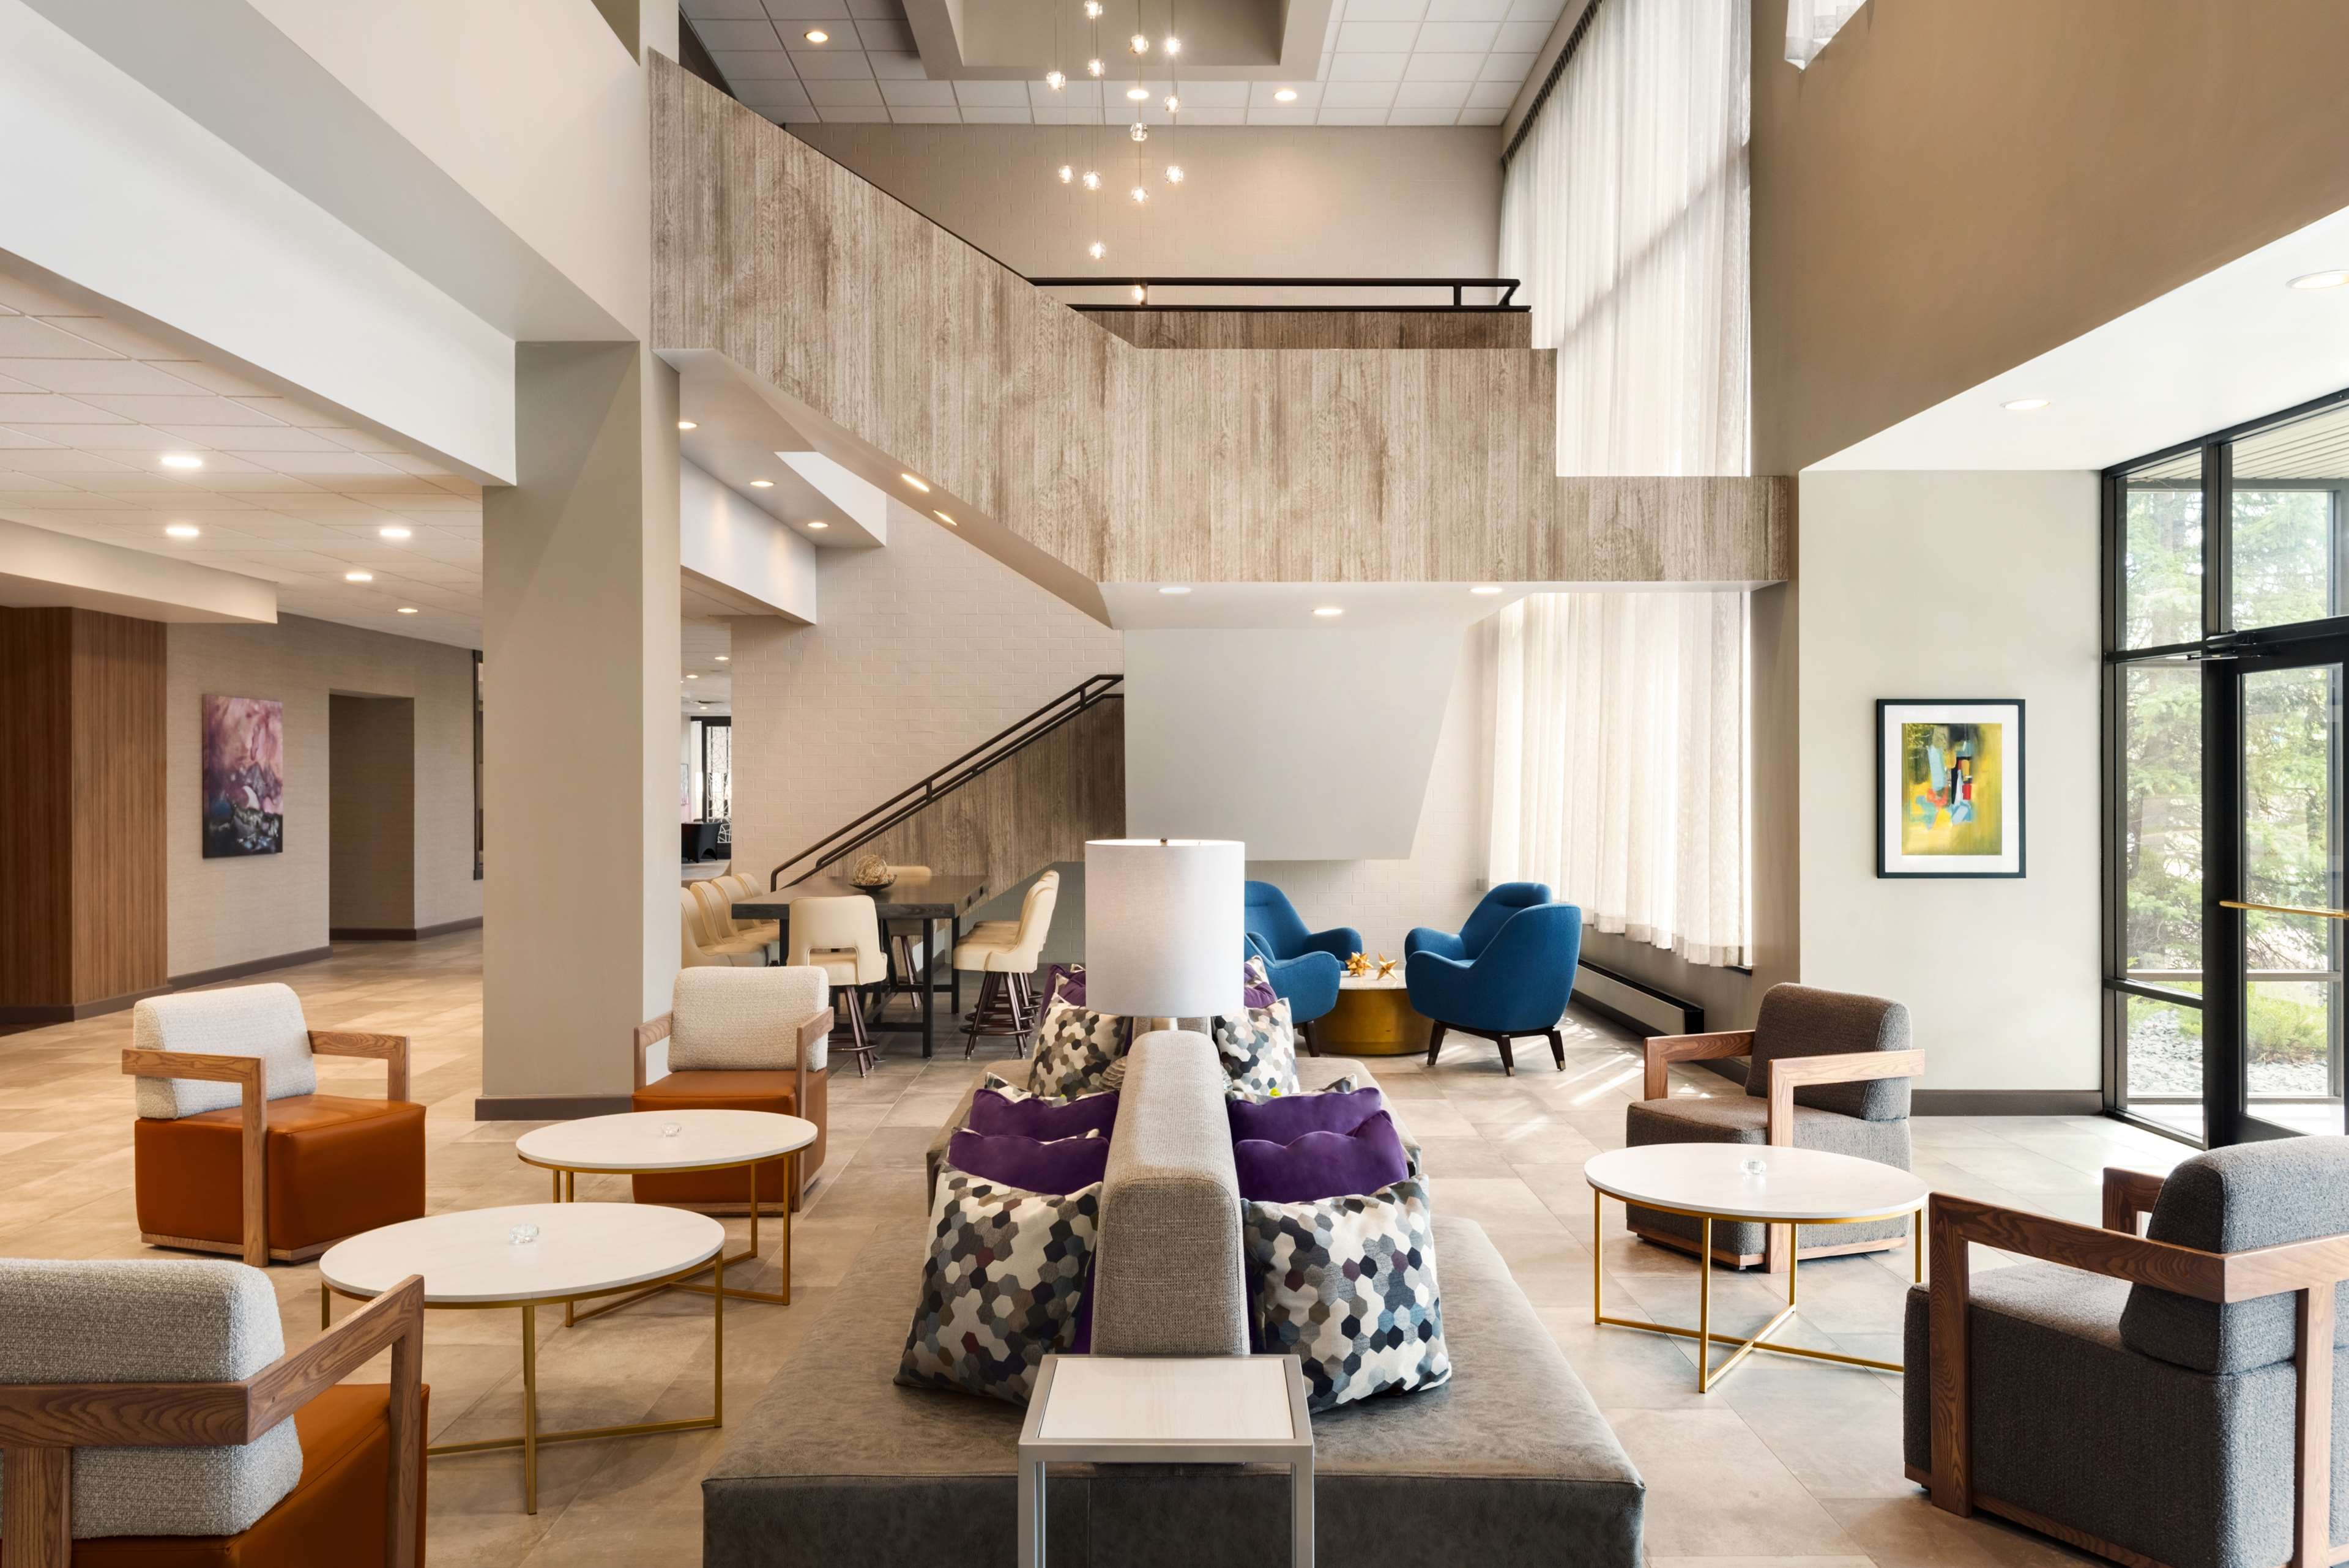 DoubleTree by Hilton St. Paul East image 2